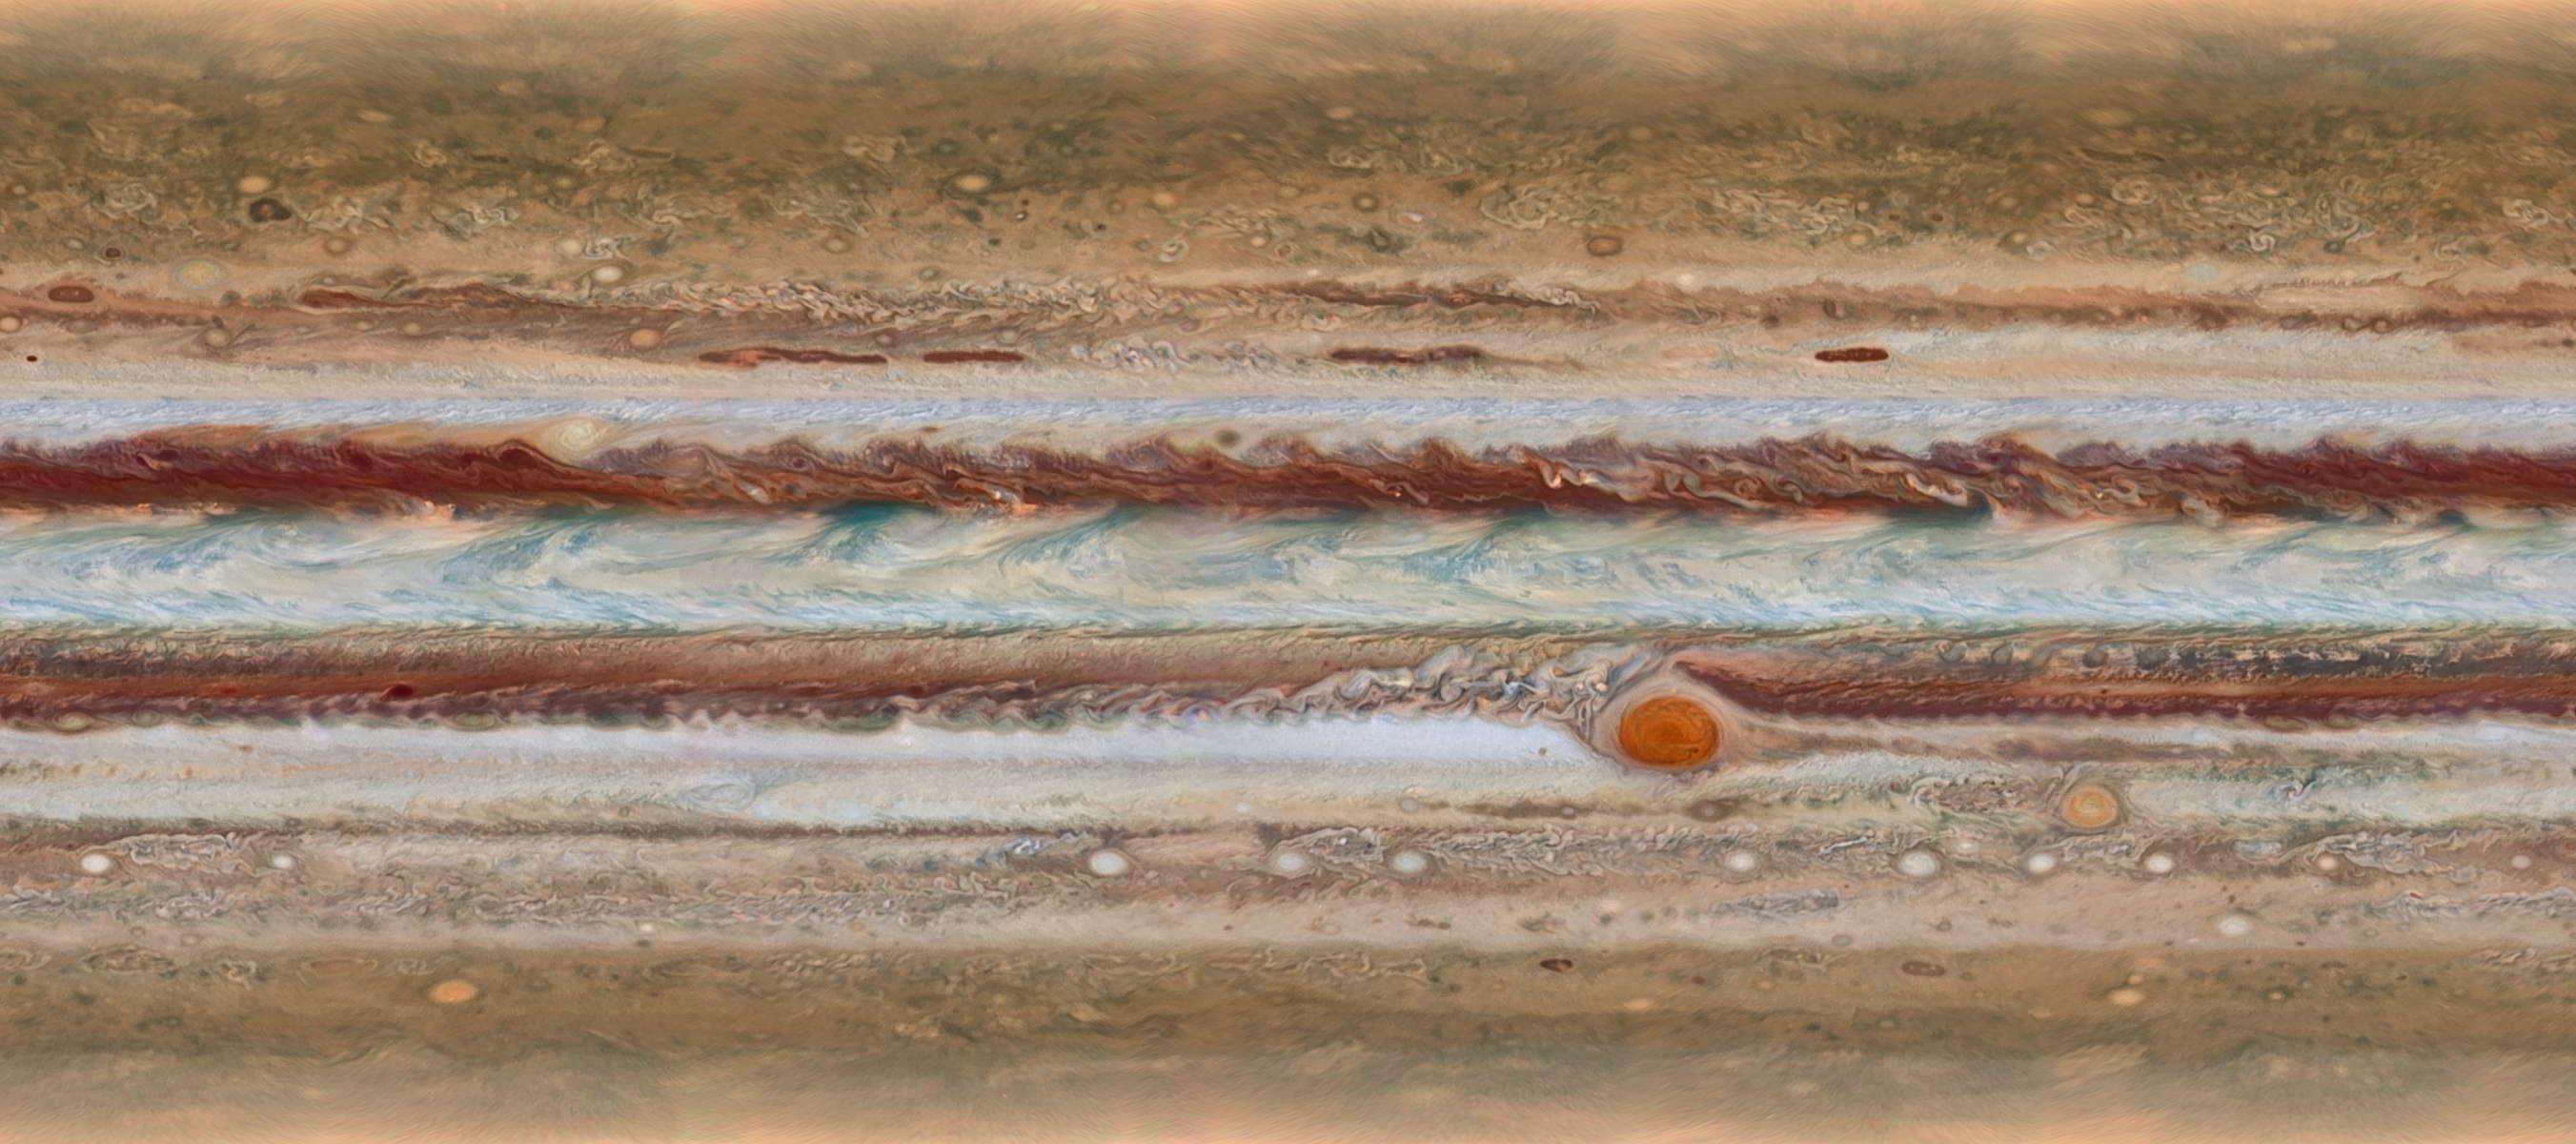 Júpiter en 2015 A